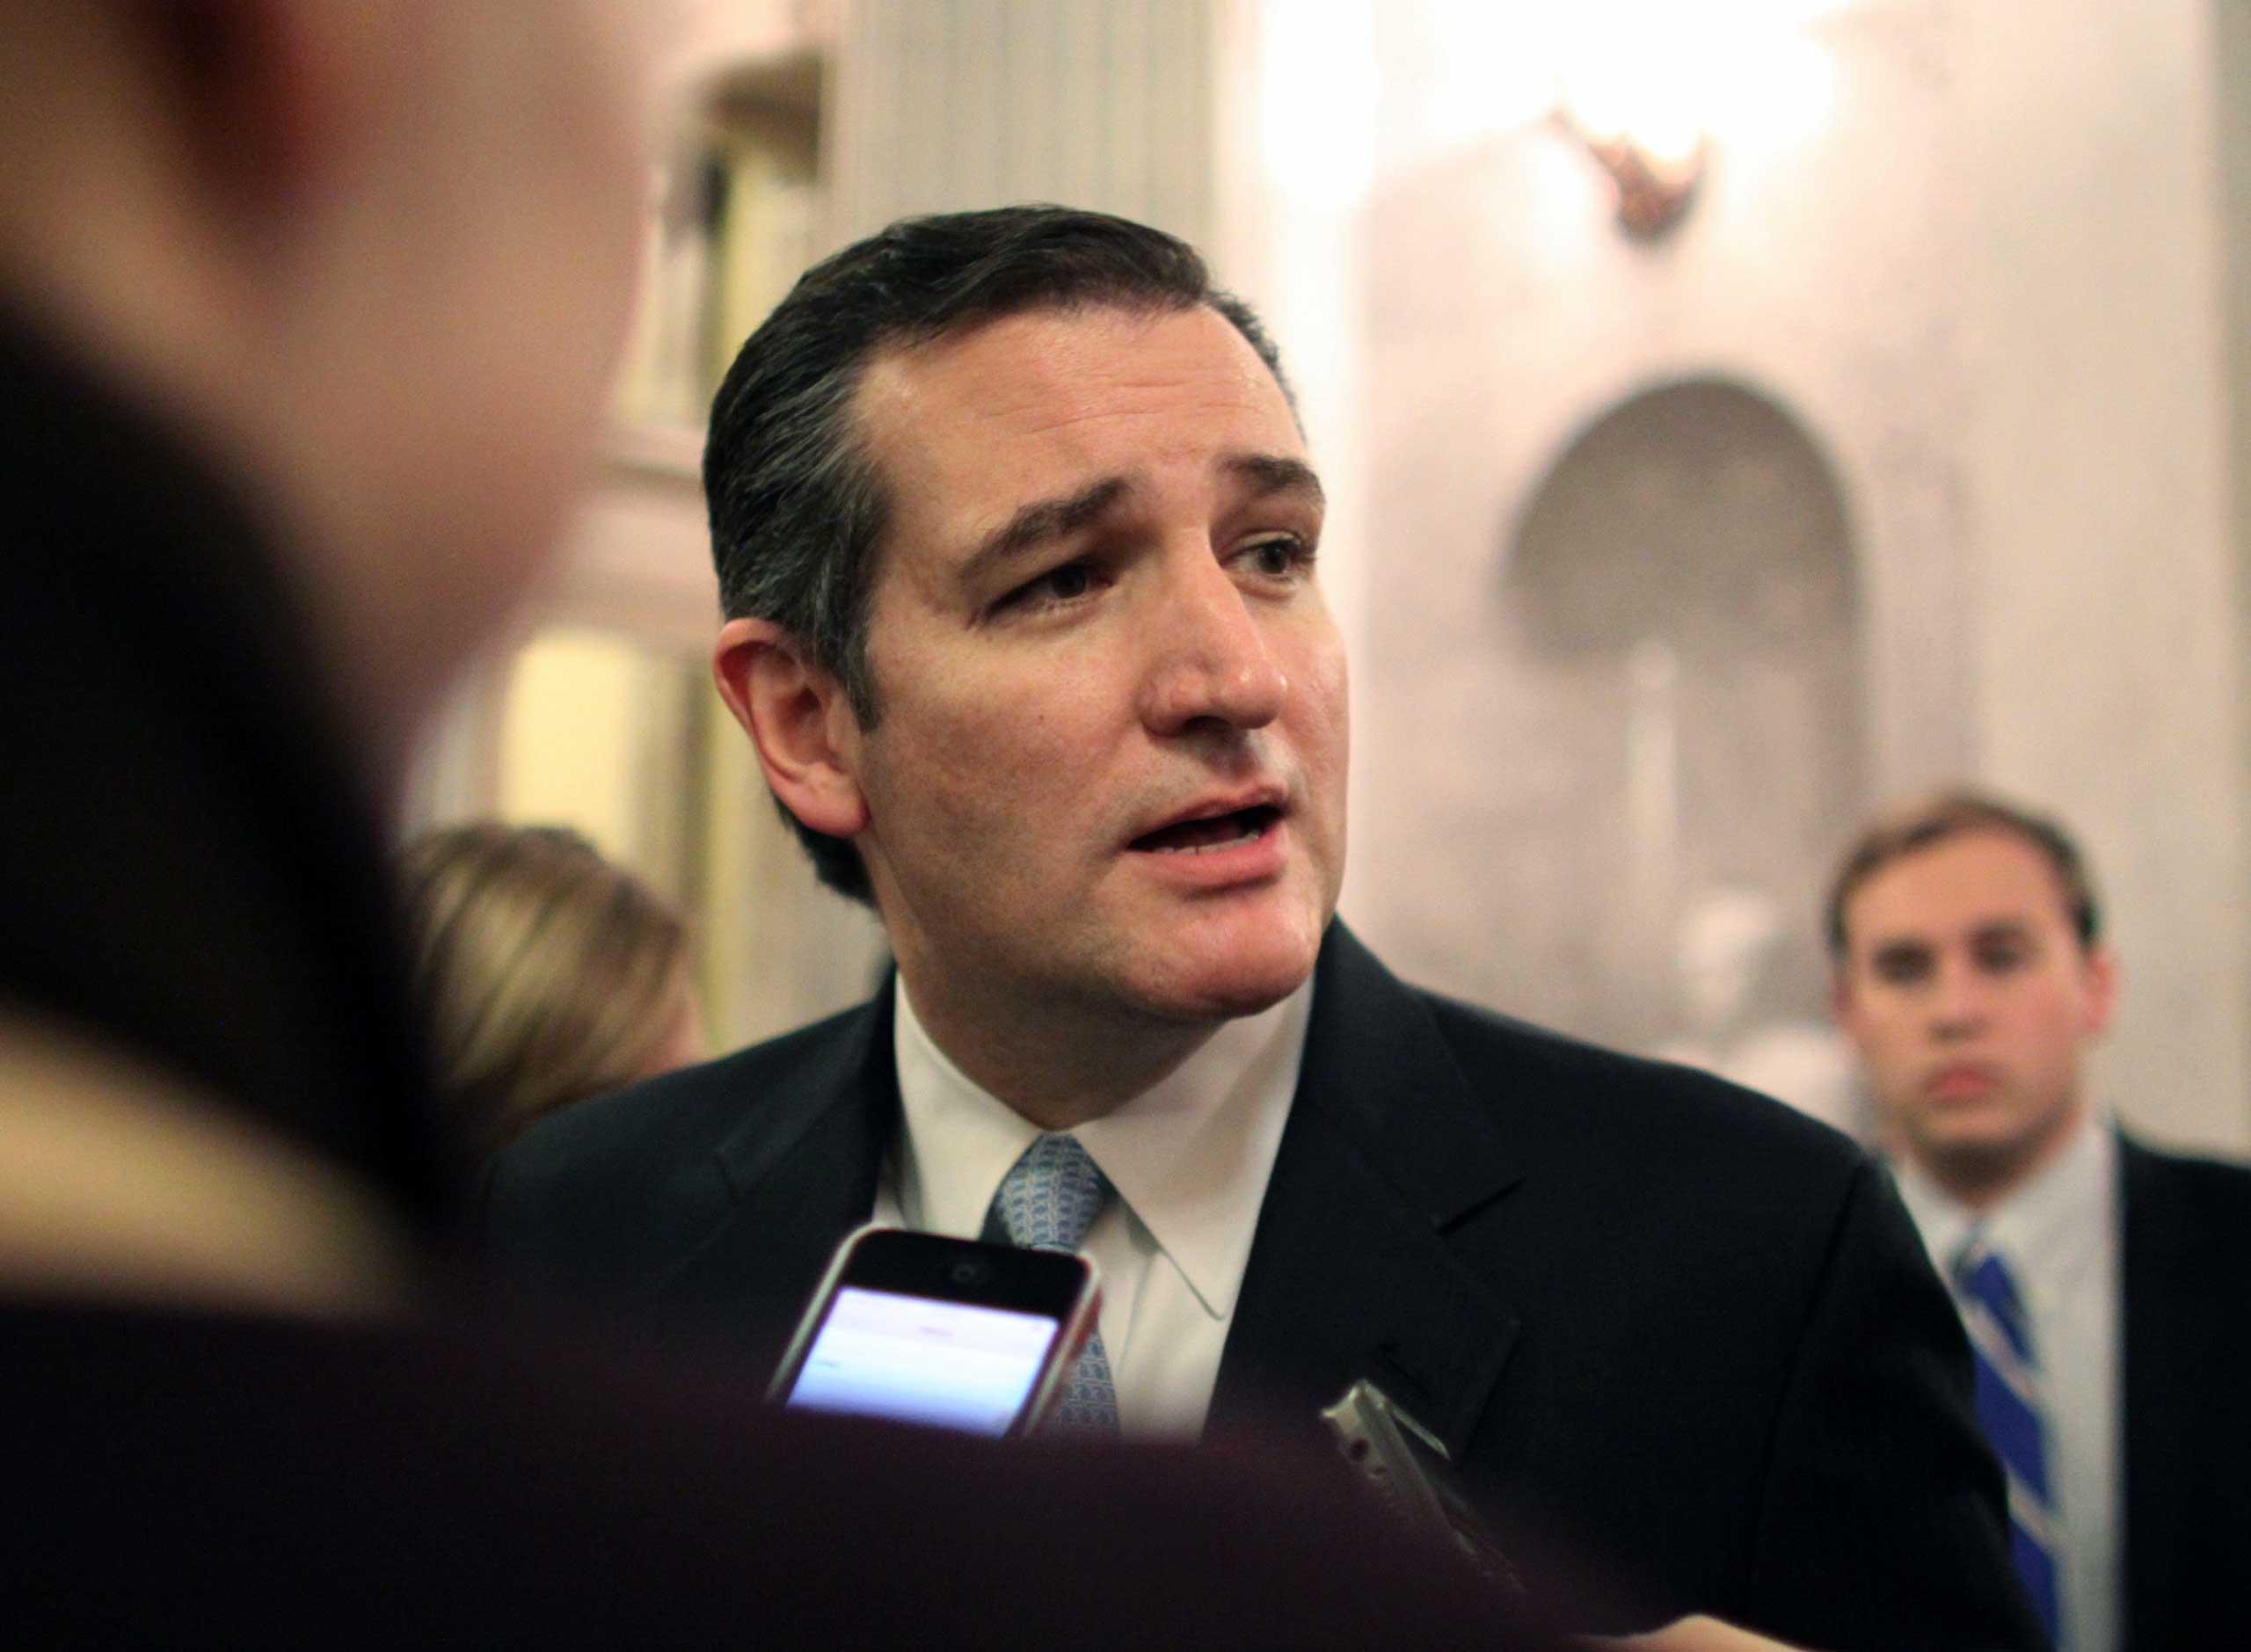 Sen. Ted Cruz (R-TX) speak to reporters on Dec. 13, 2014 on Capitol Hill in Washington.